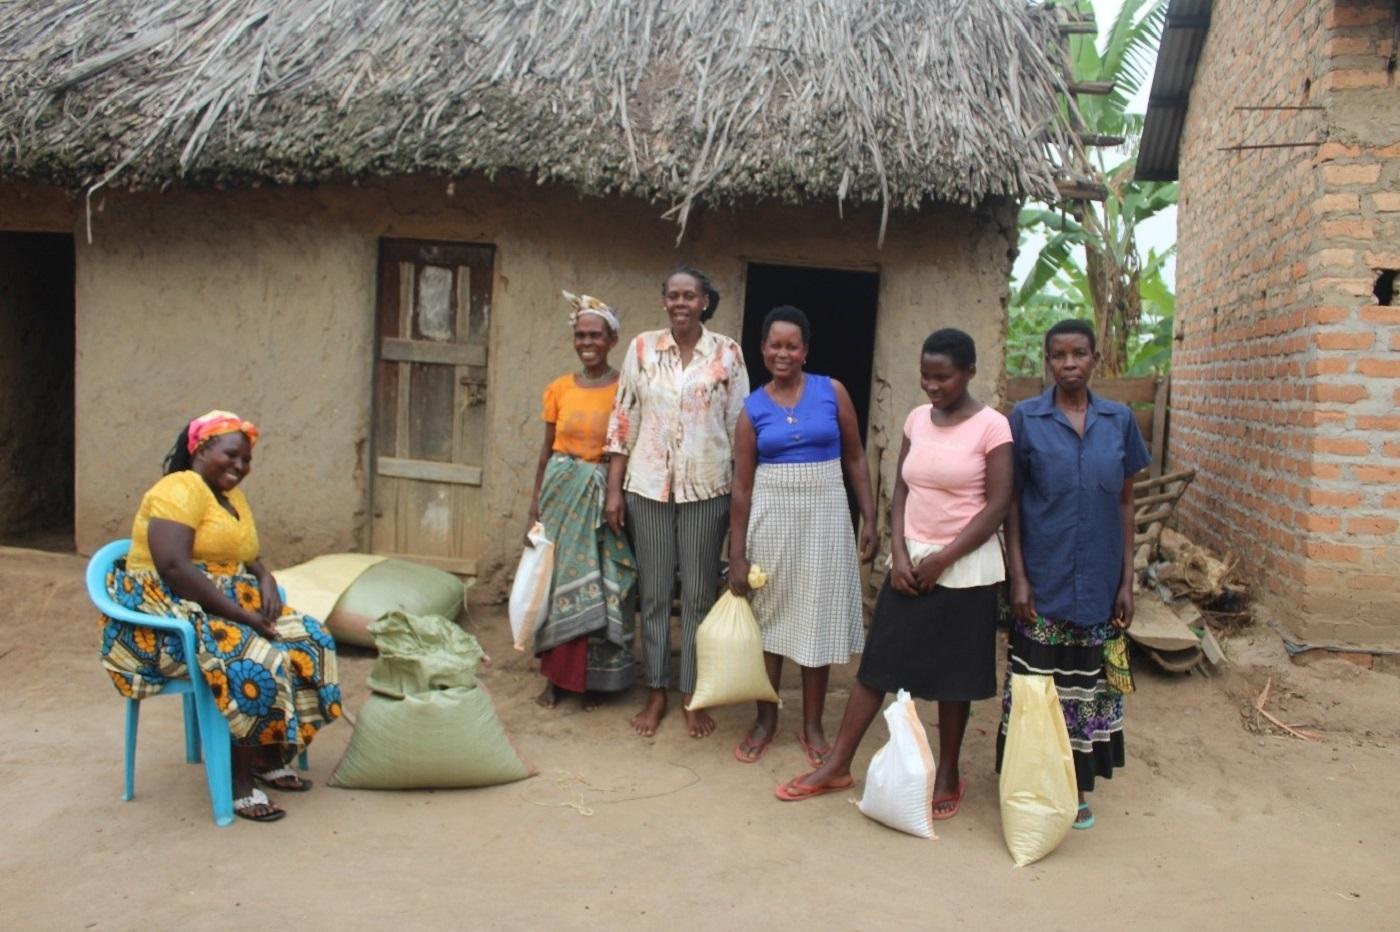 Digital know-how for rural Uganda